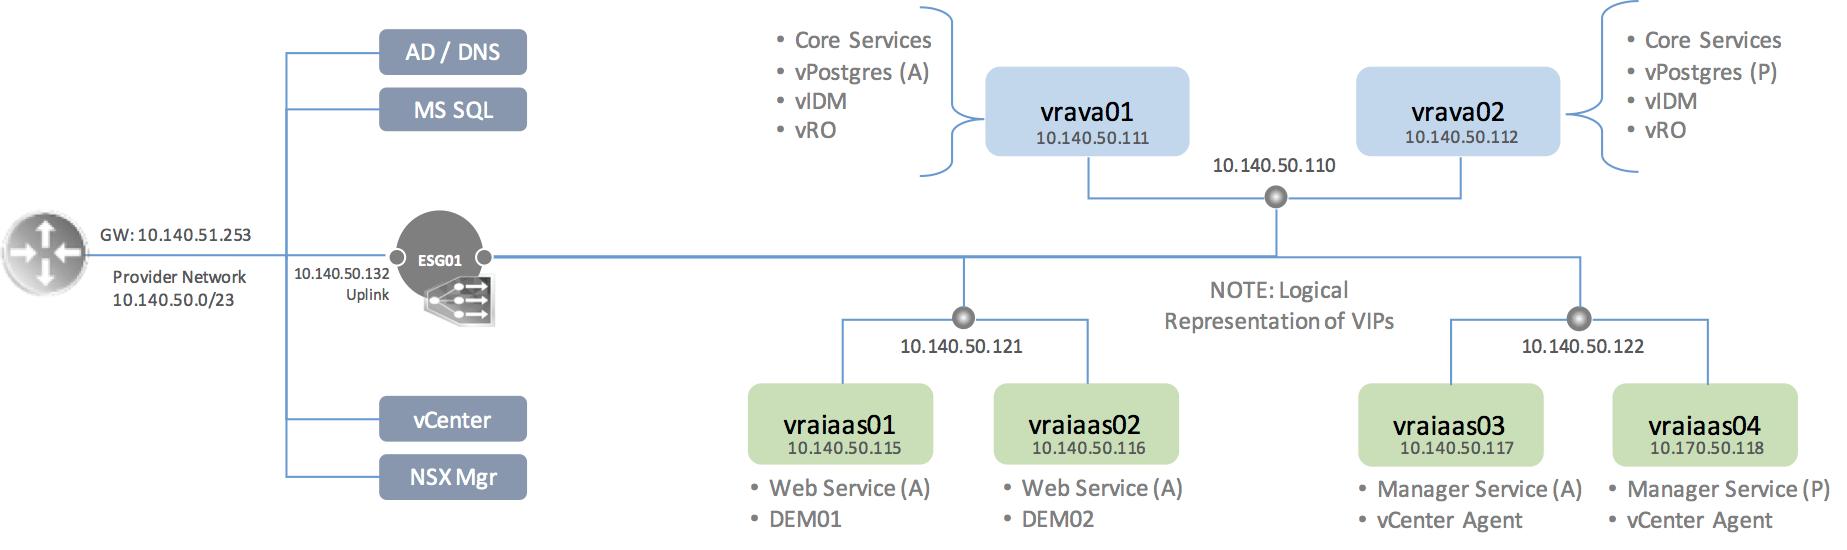 Vra 72 dig 061 nsx load balancer config virtualjad the vra load balancing guide provides additional details and load balancing guidelines for nsx f5 and netscaler publicscrutiny Images